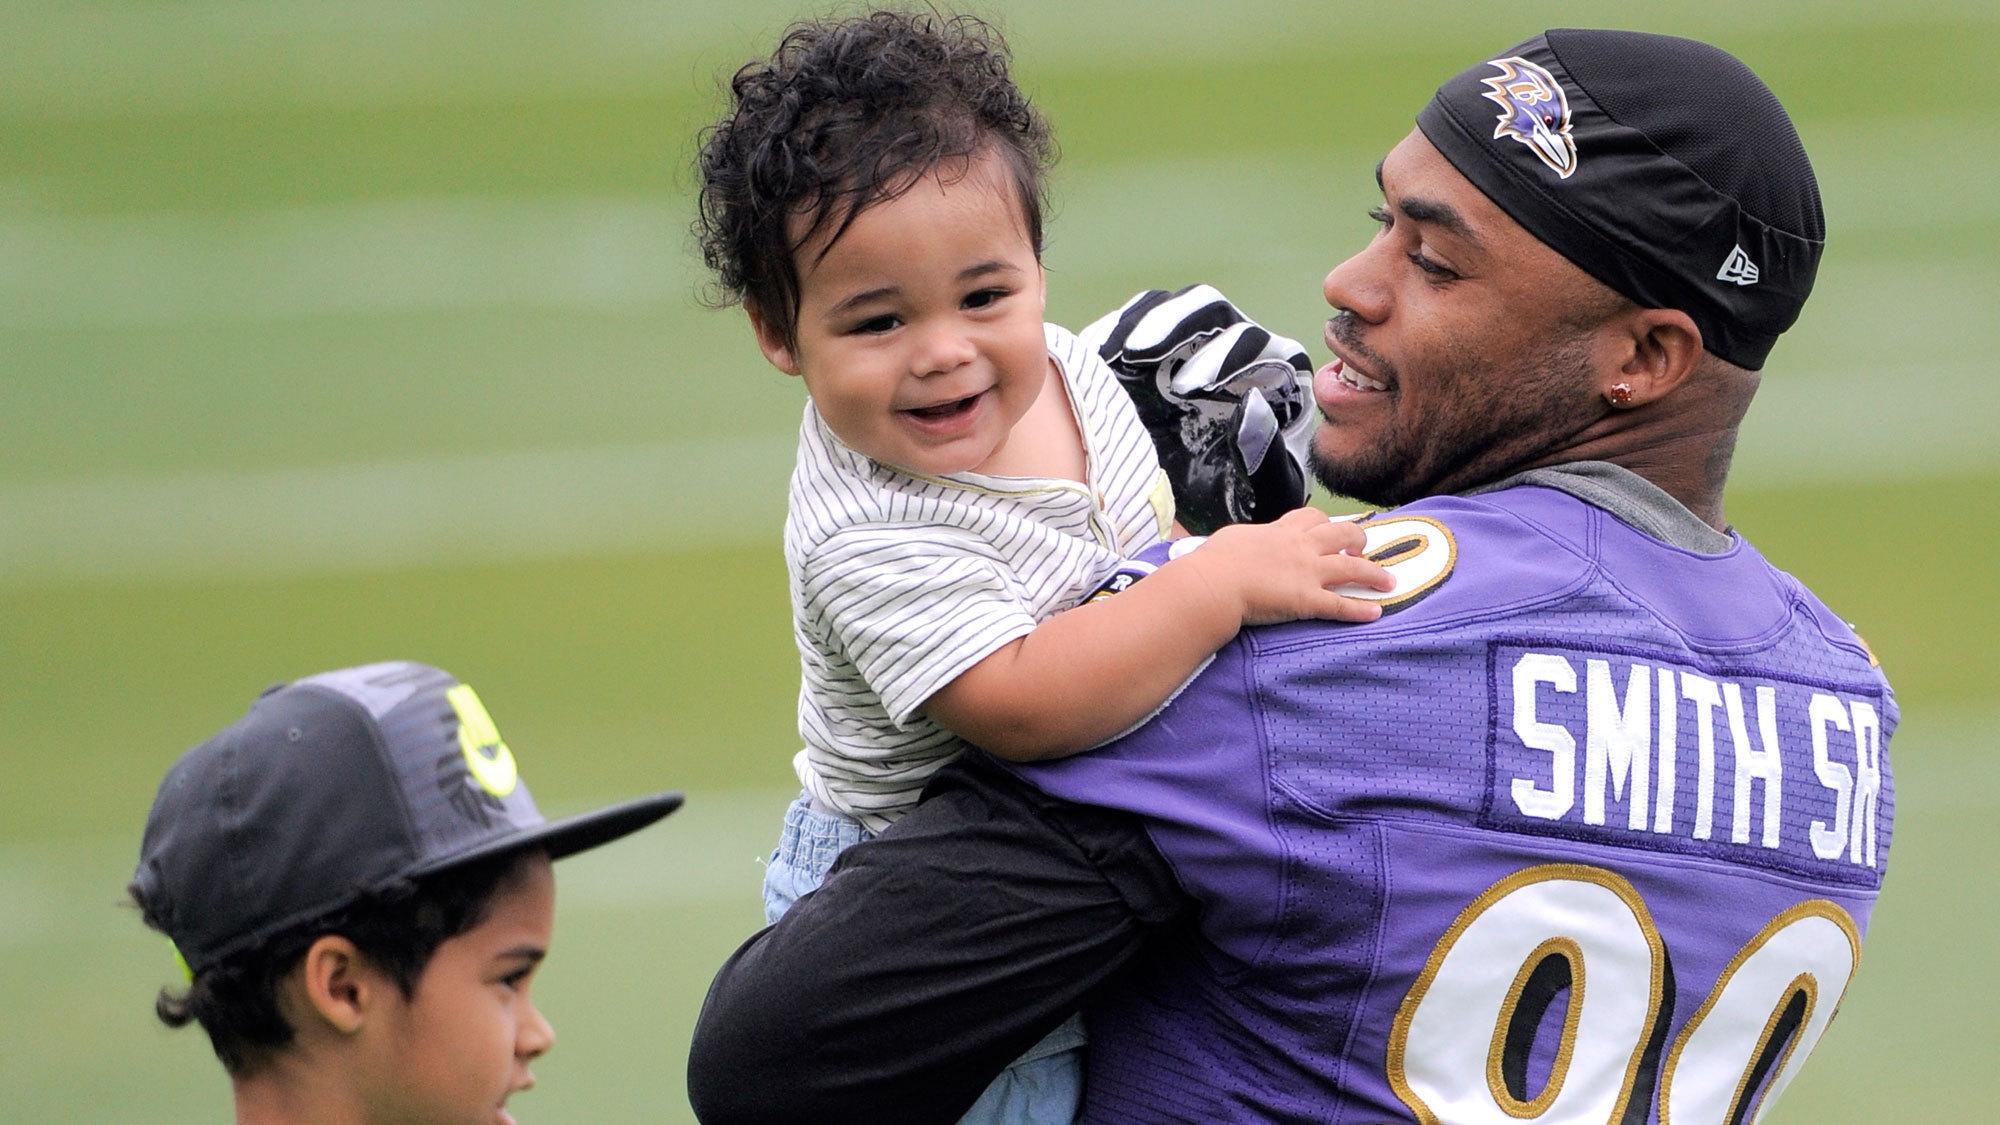 For Baltimore Ravens wide receiver Steve Smith Sr family always